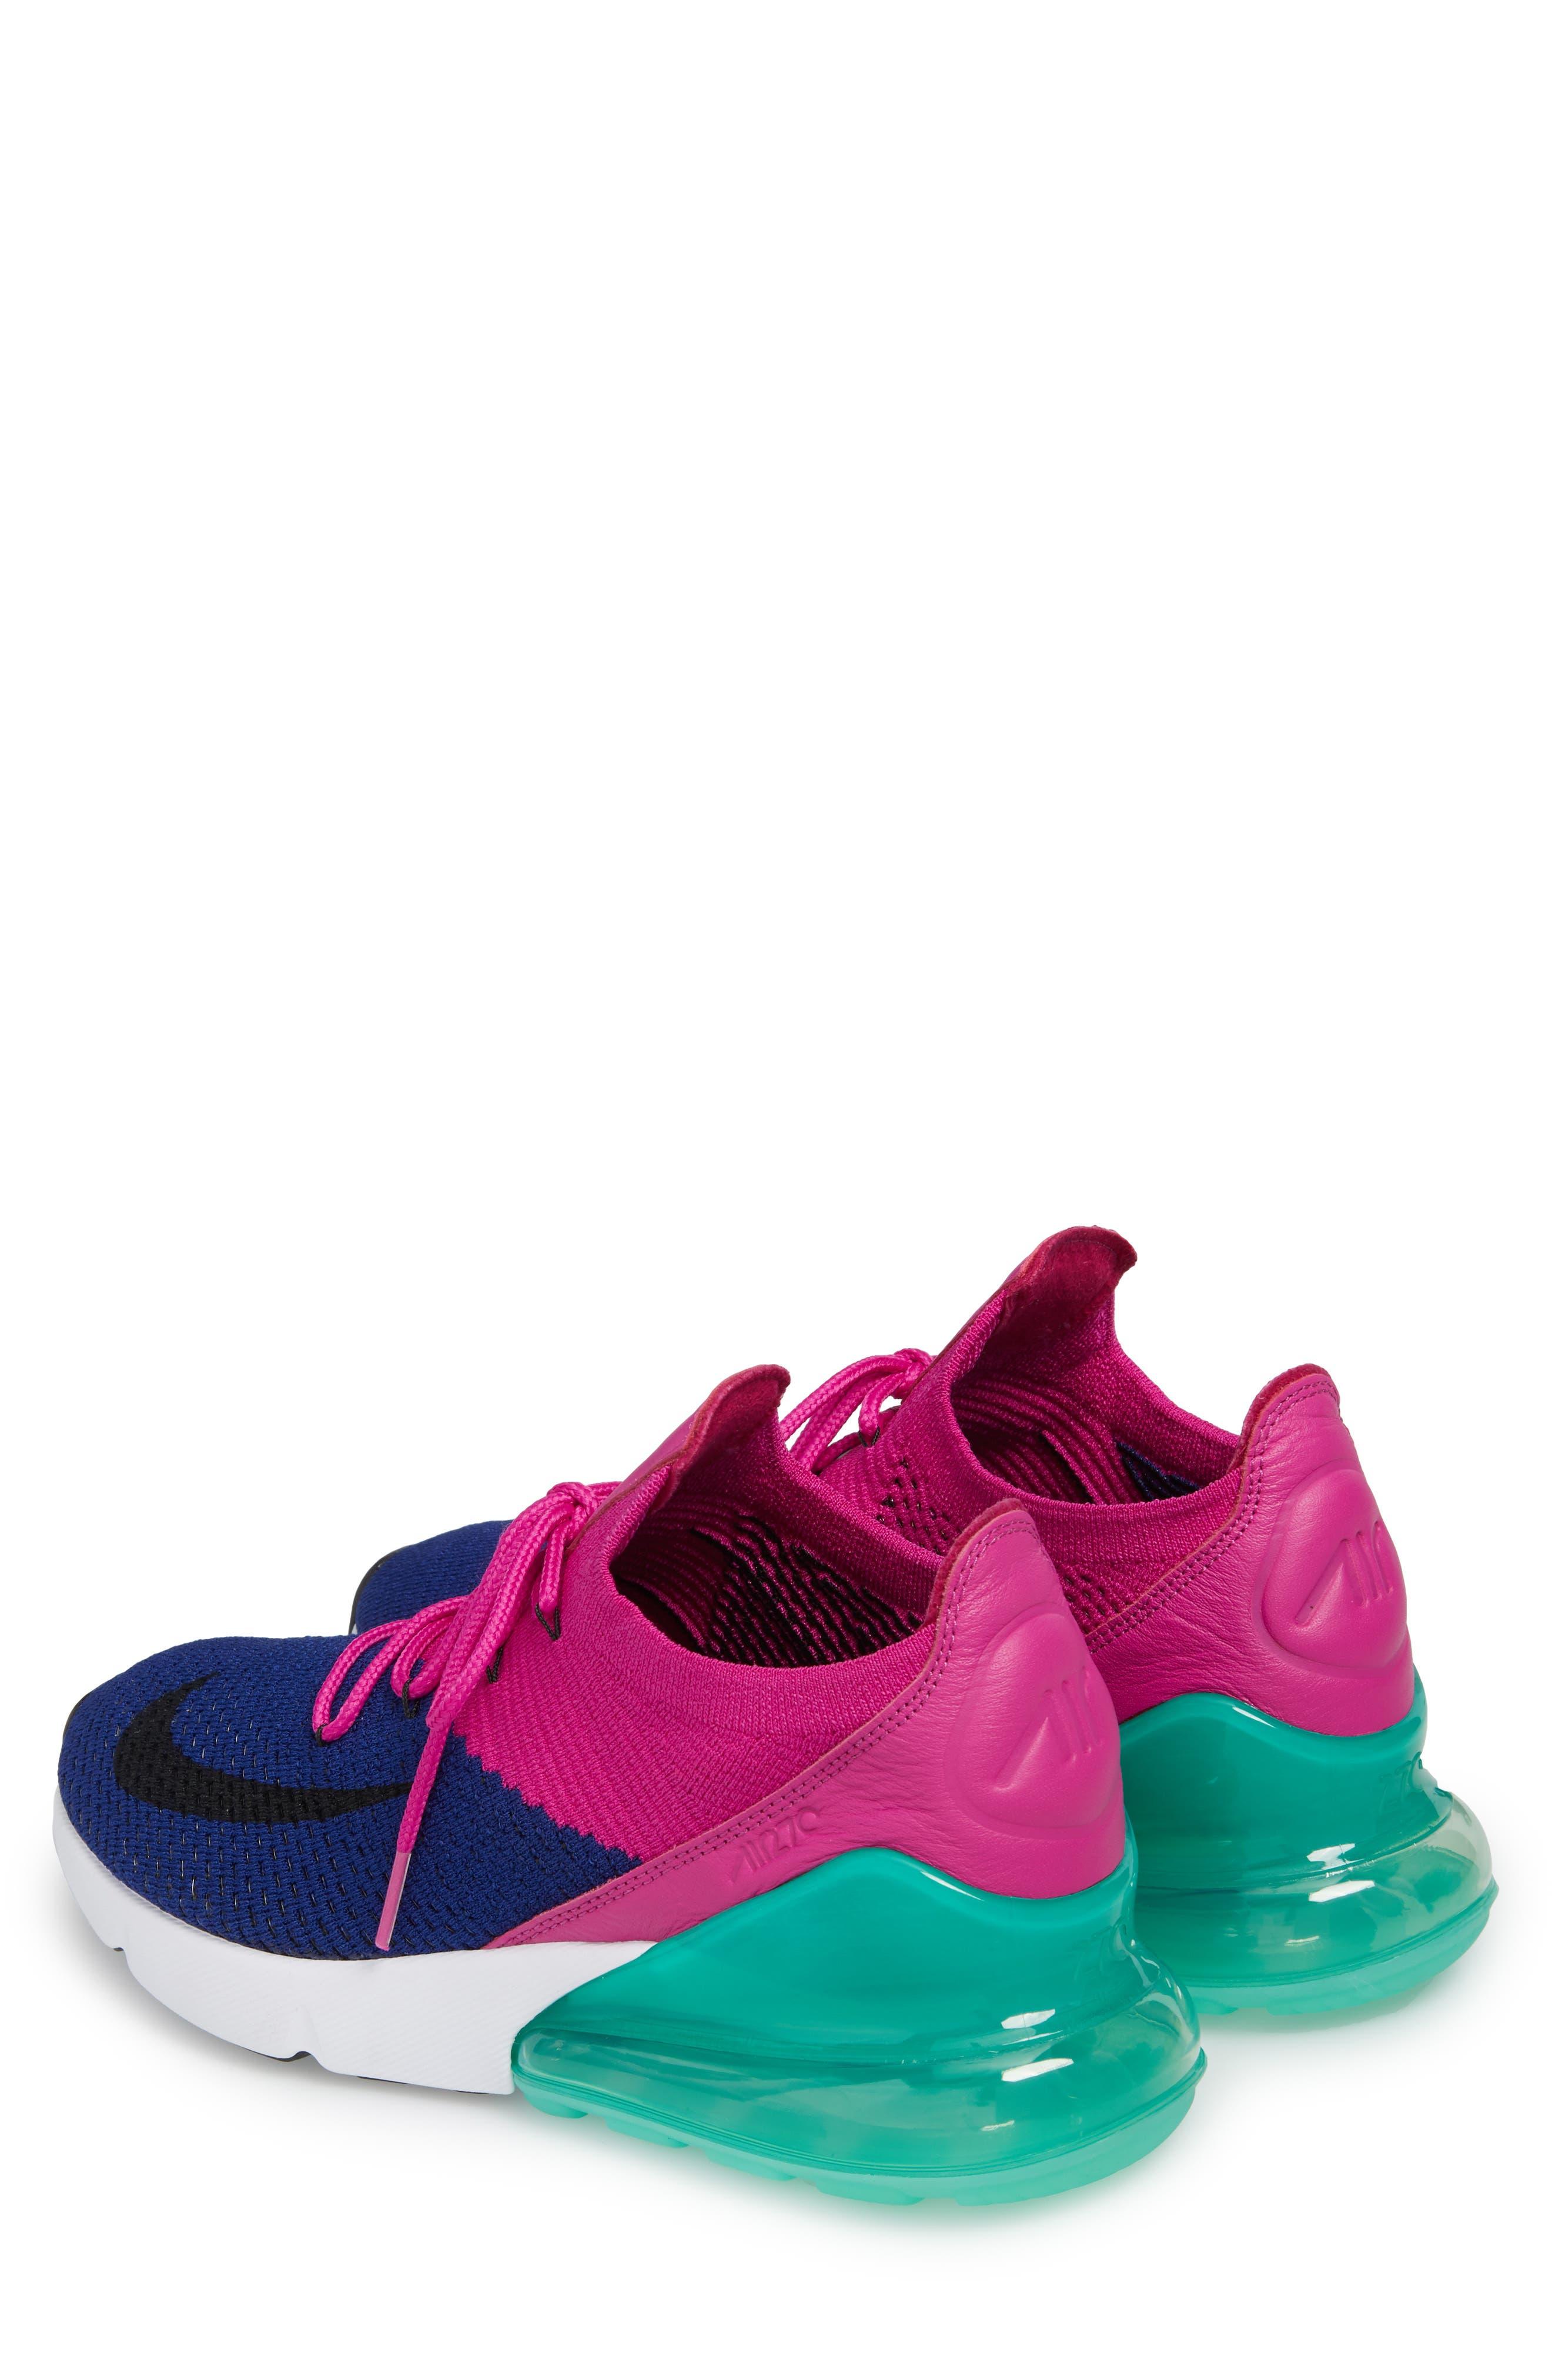 Air Max 270 Flyknit Sneaker,                             Alternate thumbnail 2, color,                             Deep Royal Blue/ Black